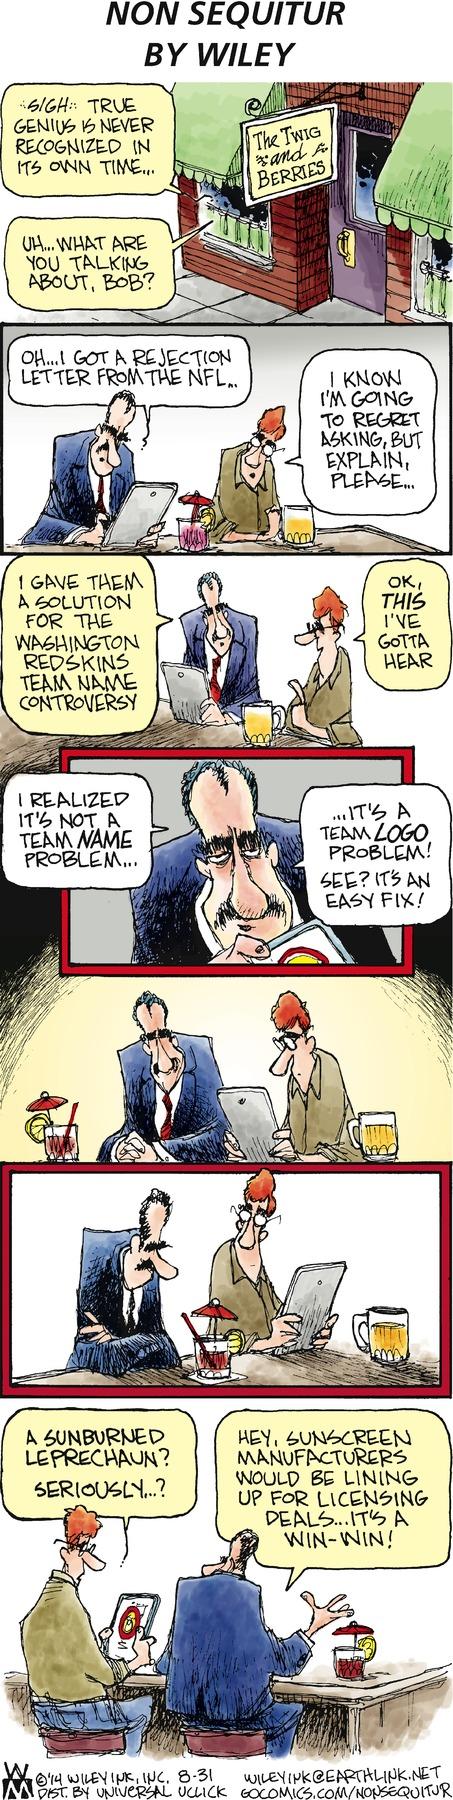 Non Sequitur Comic Strip for August 31, 2014